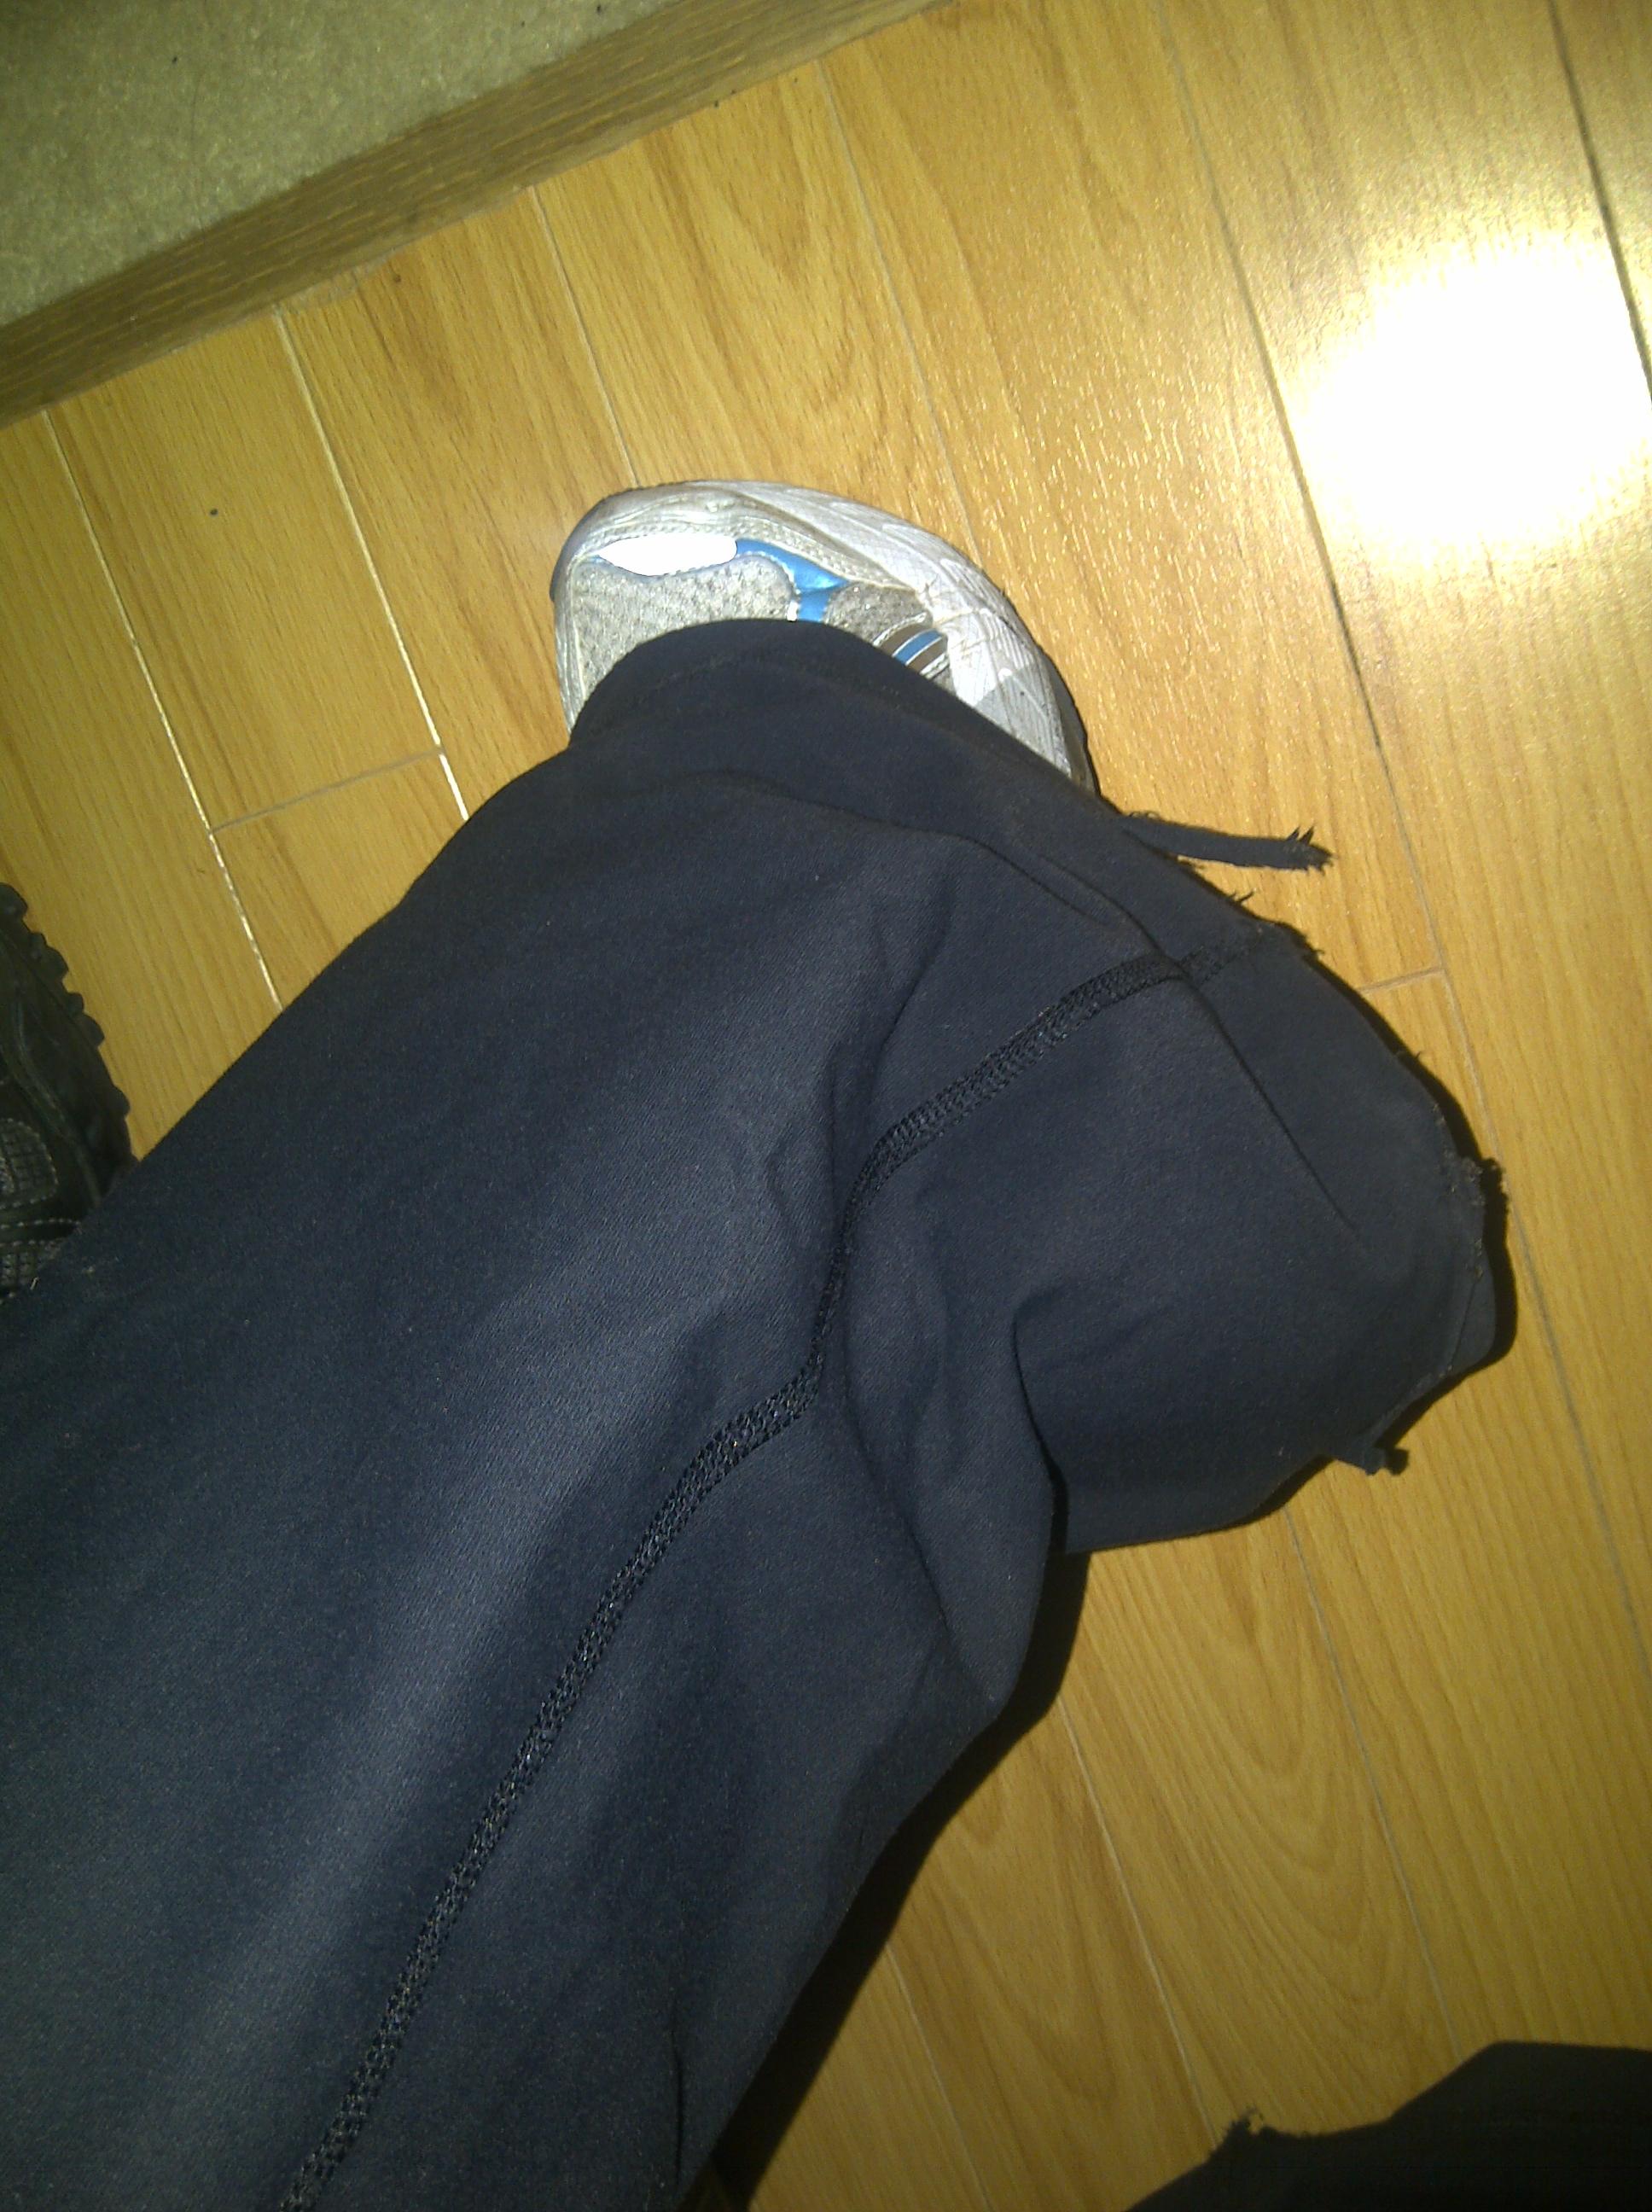 Yoga Pants Torn These Yoga Pants Have Taken a